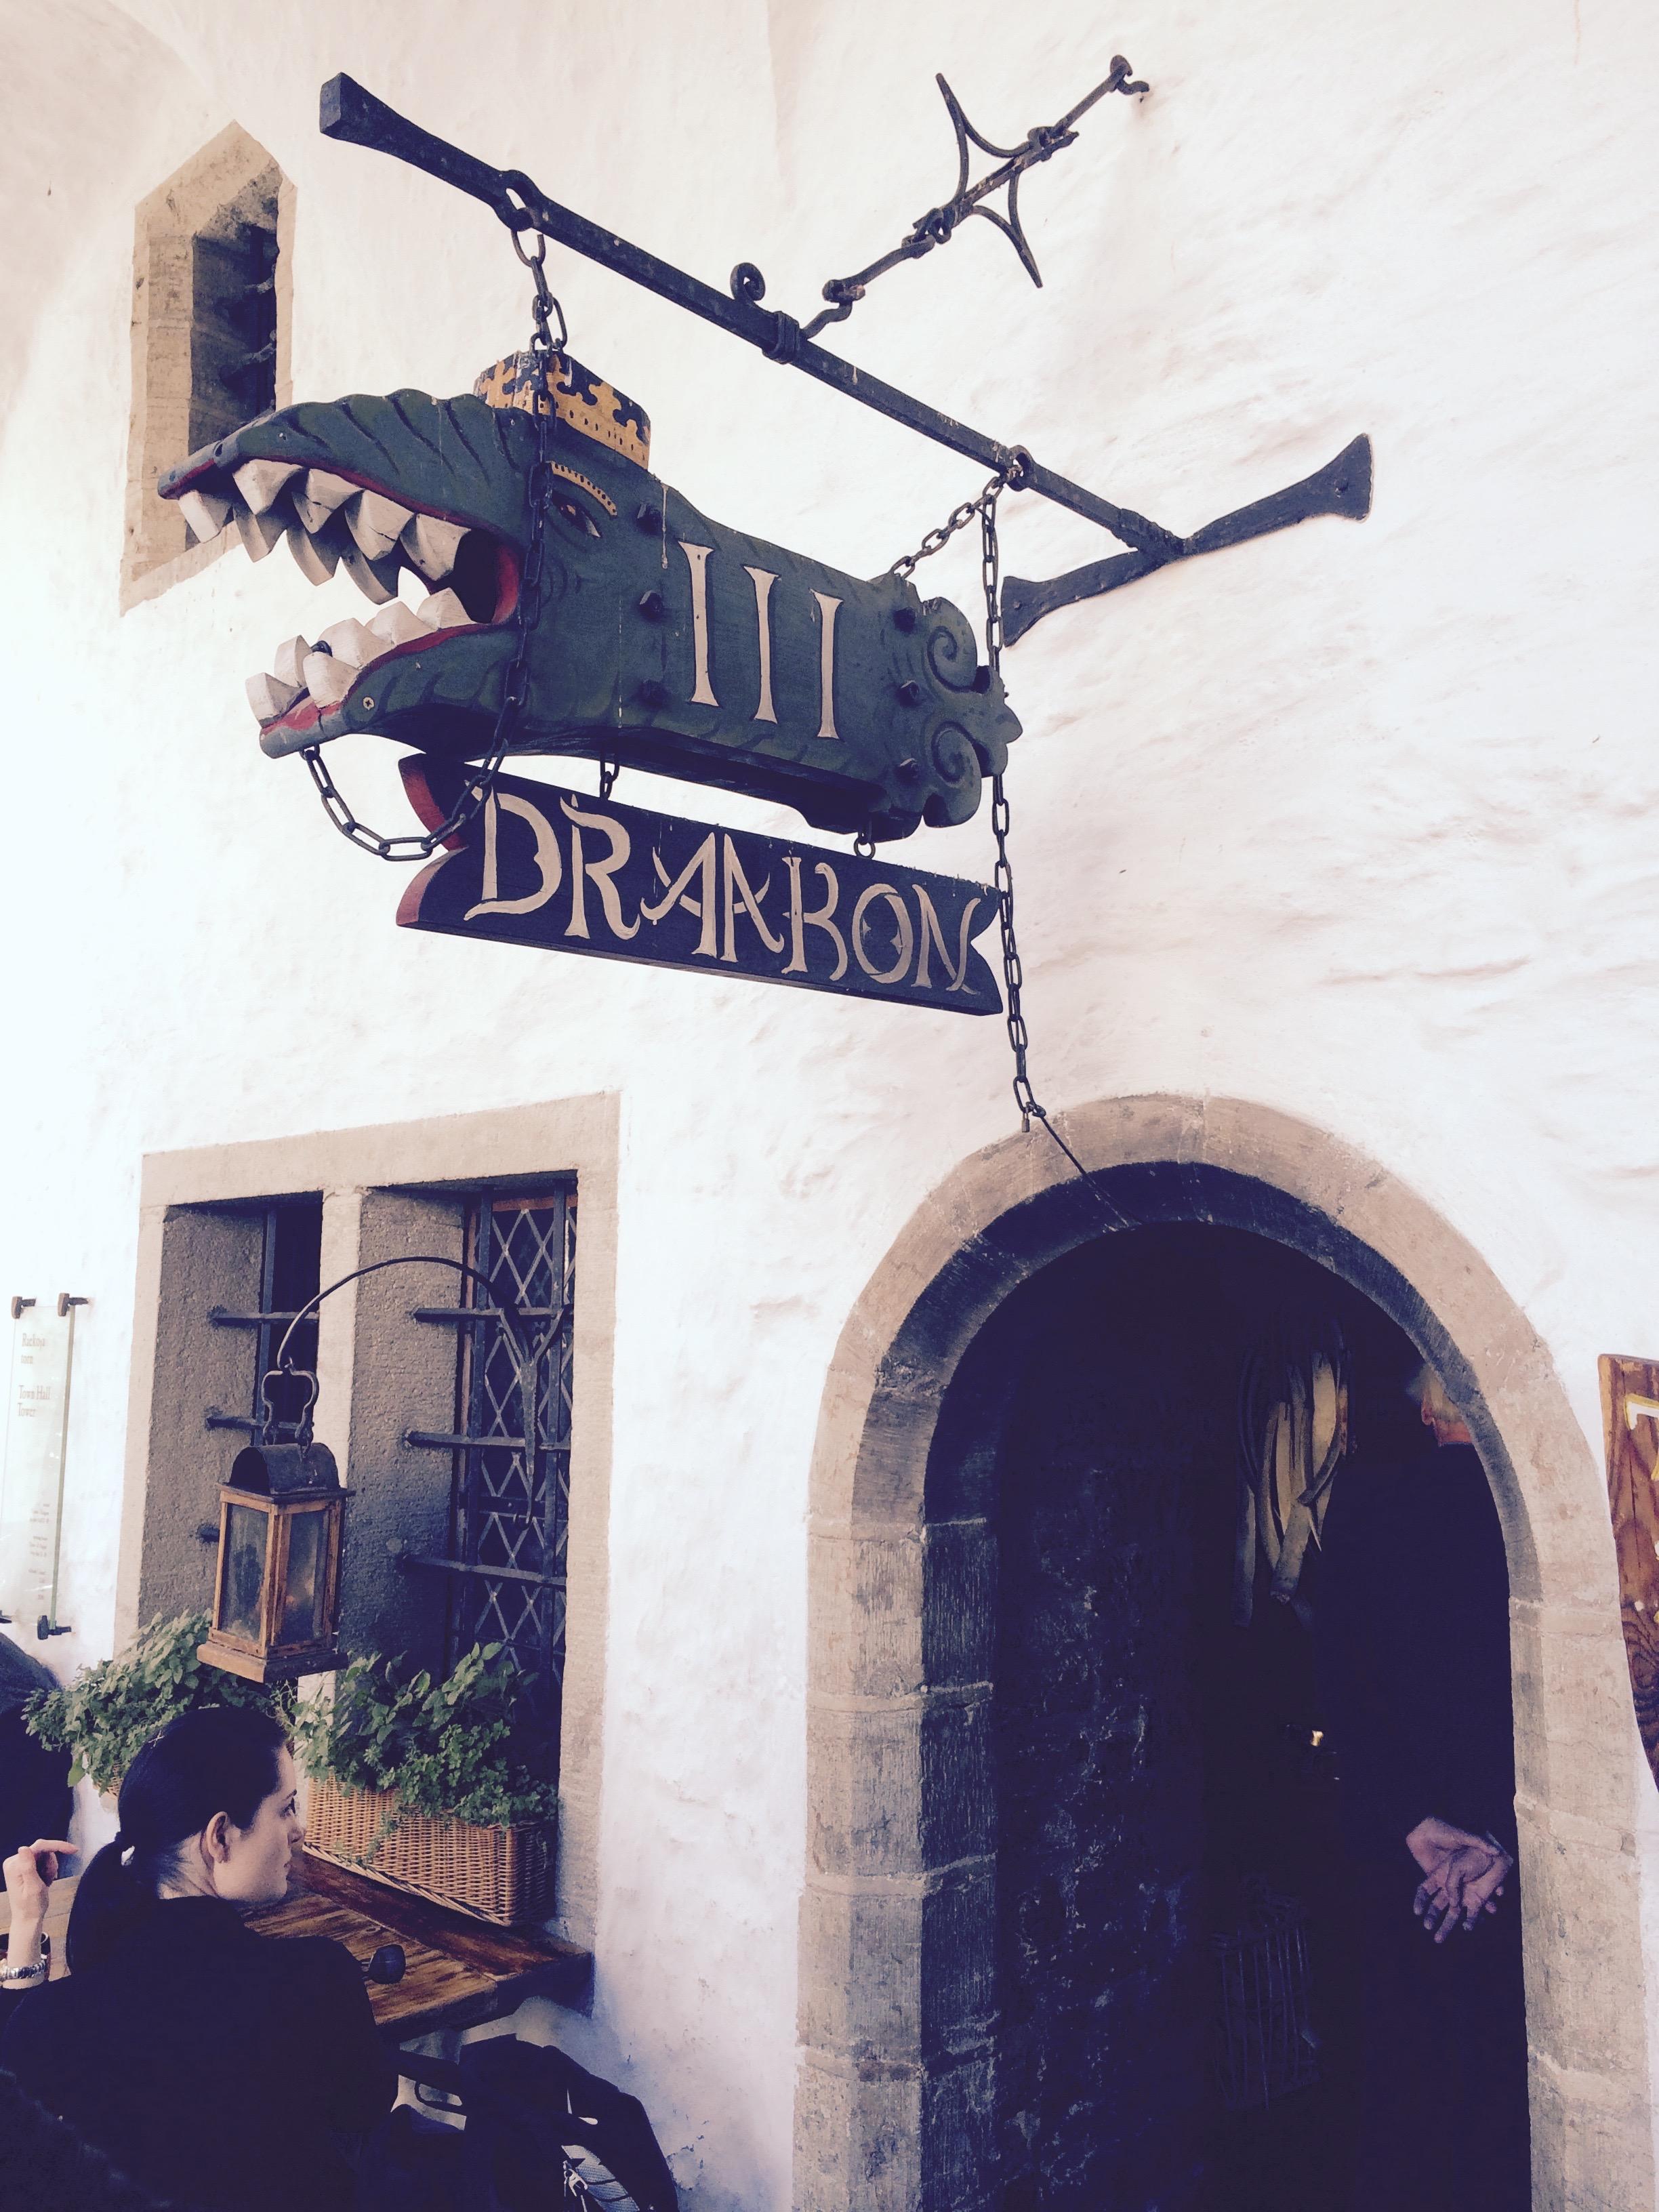 III Draakon - Medieval Tavern in Tallinn, Estonia